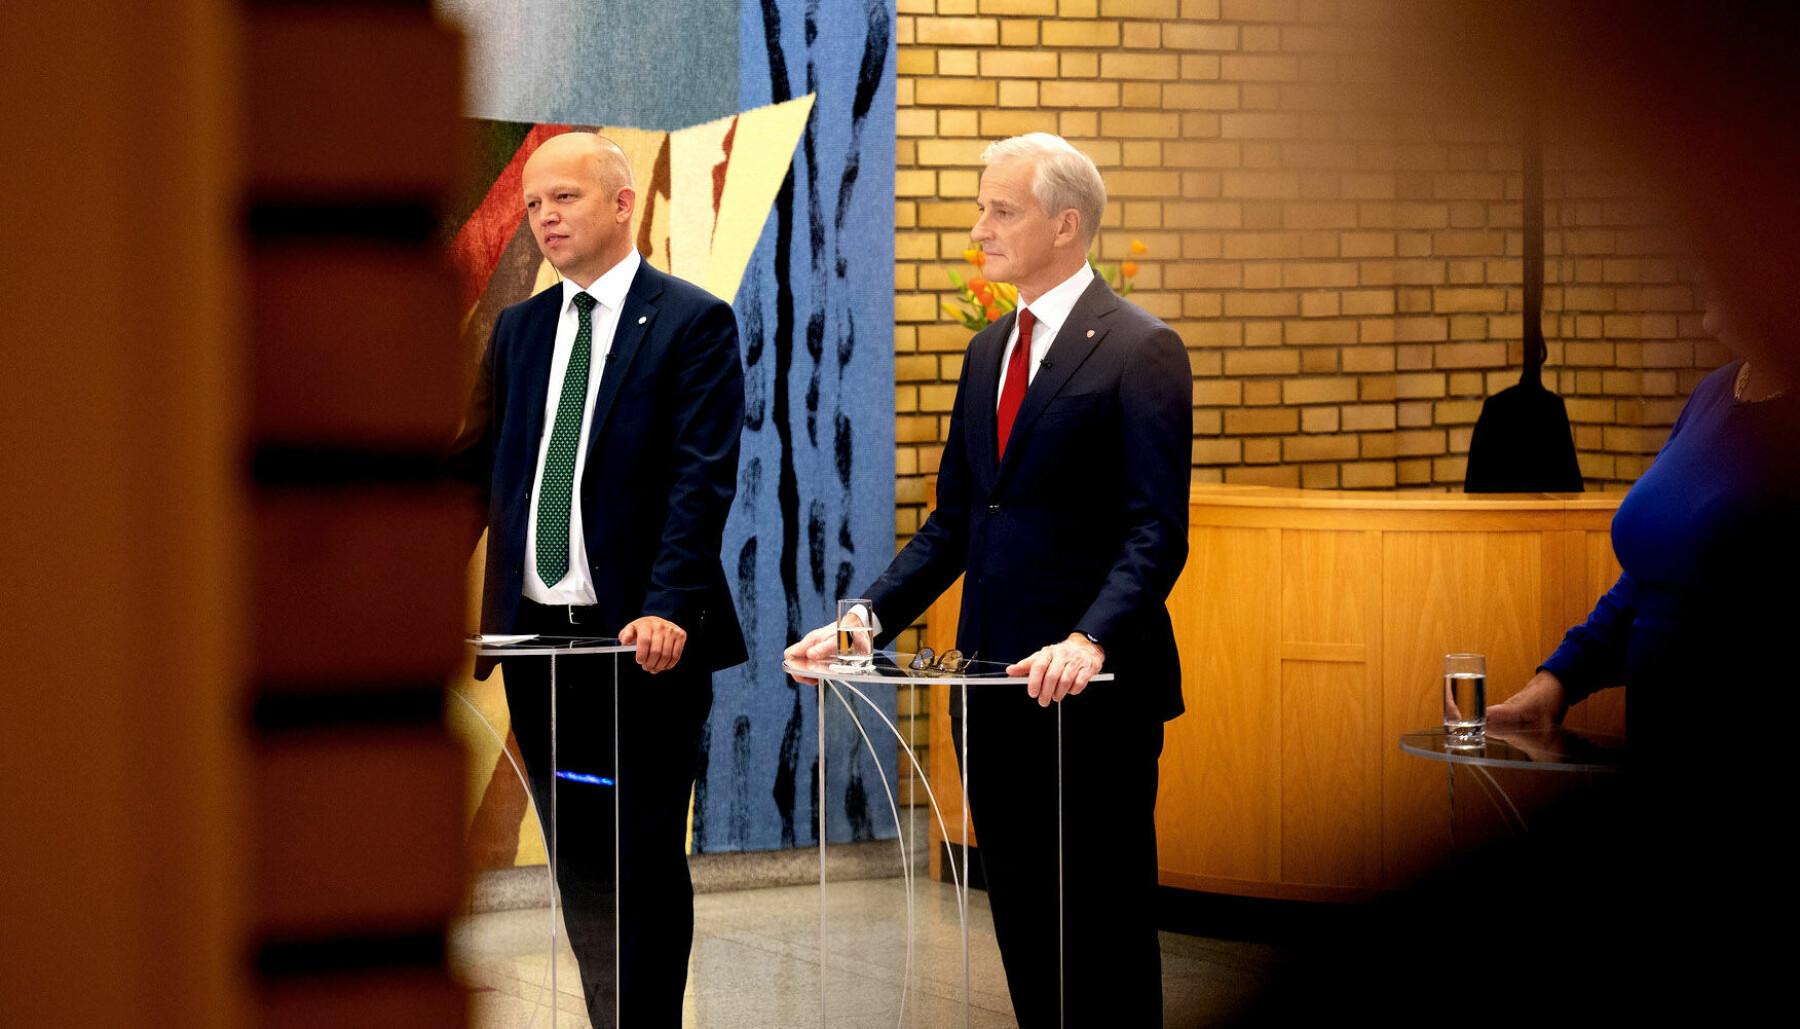 Partilederne Trygve Slagsvold Vedum (Sp) og Jonas Gahr Støre under valgnattens partiledersamtale på Stortinget.